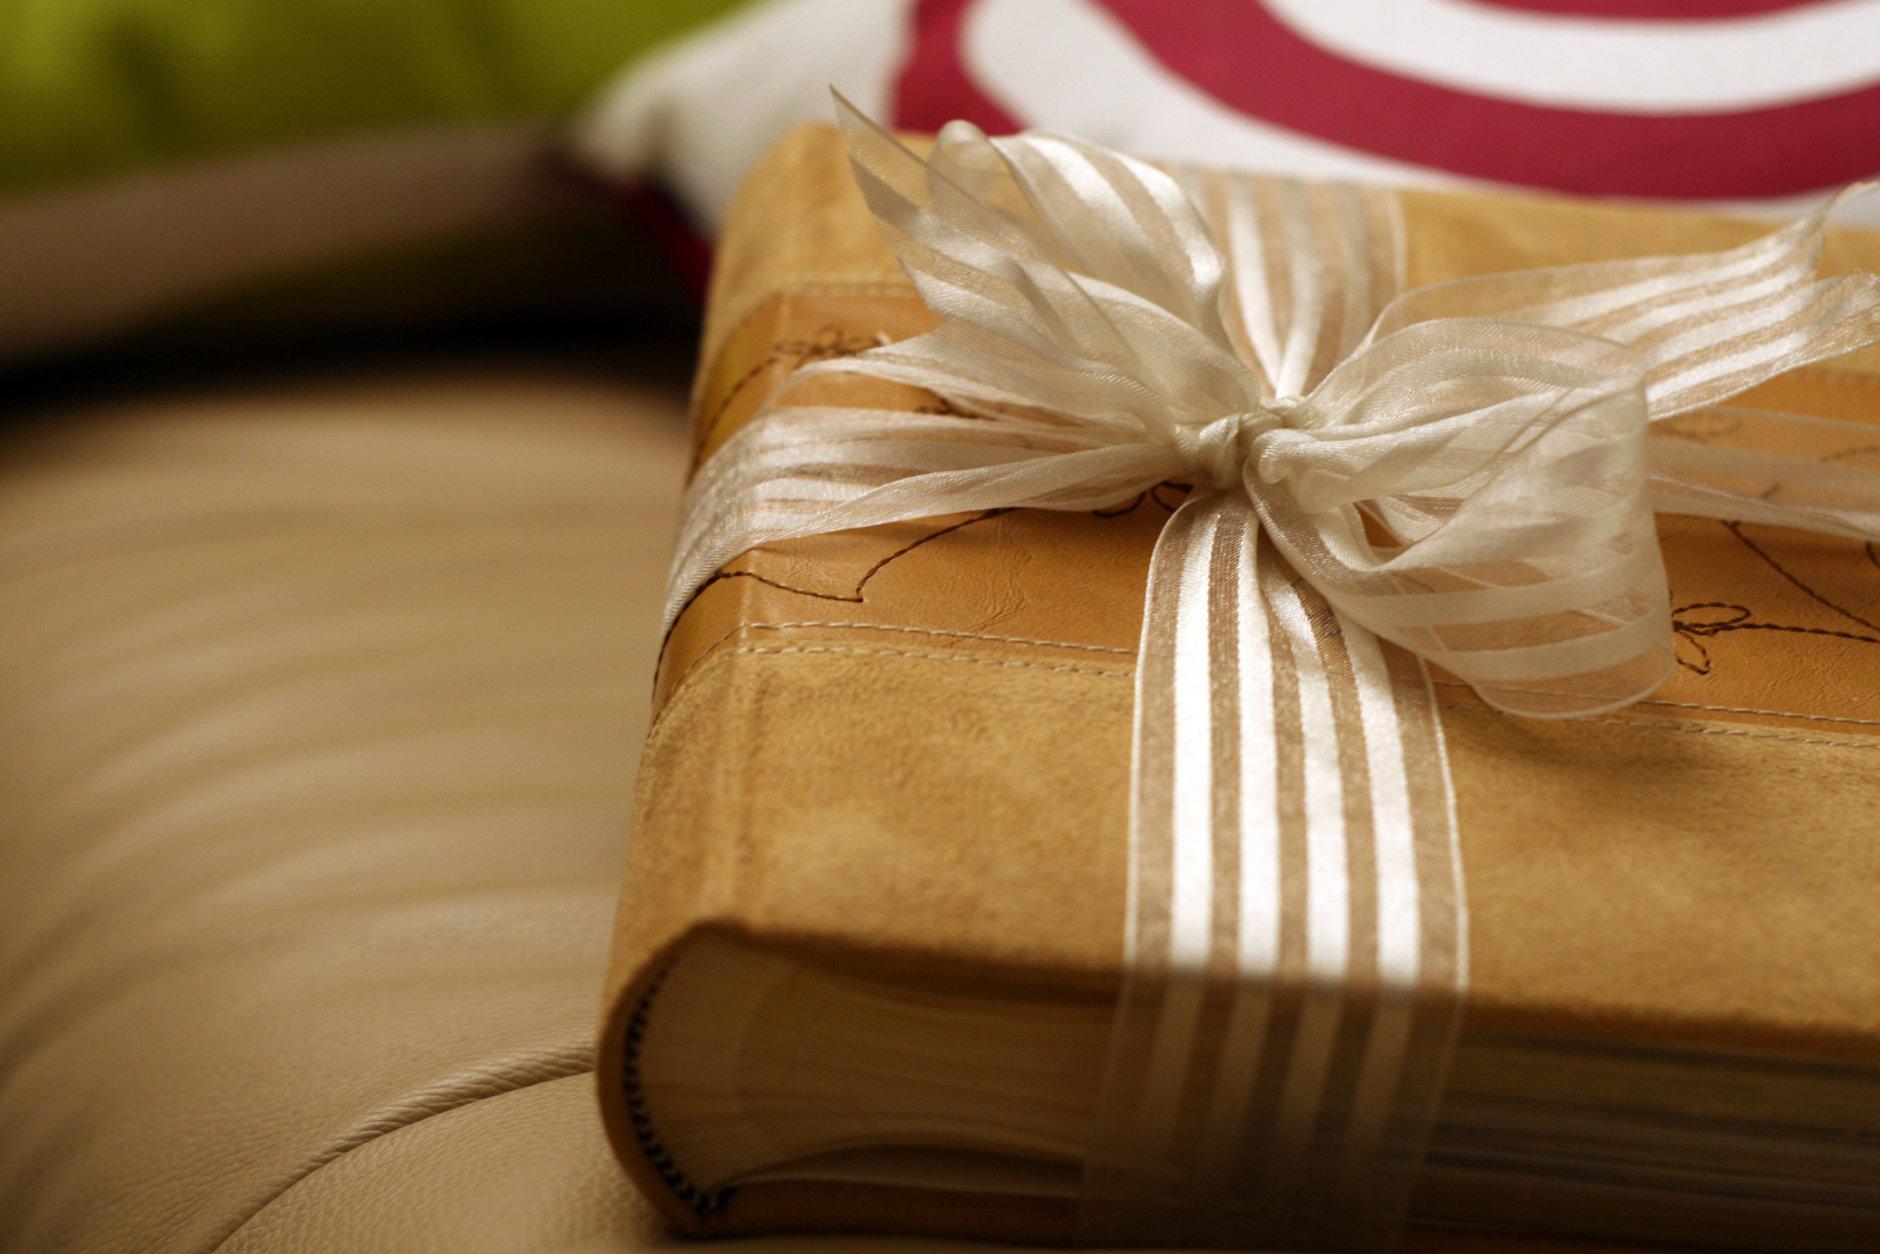 Photo album as a present